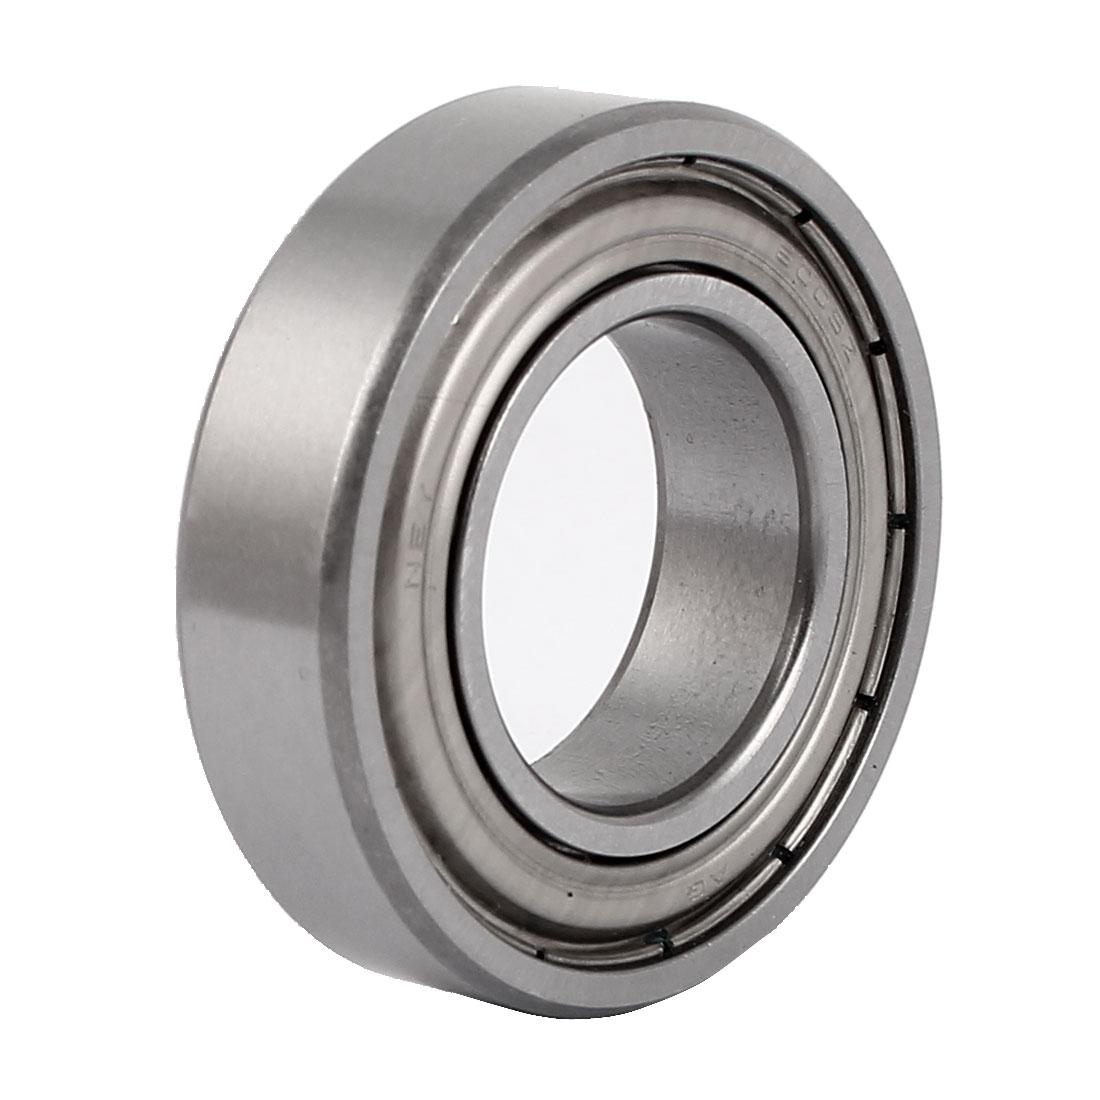 ZZ6005 47mmx25mmx12mm Single Row Deep Groove Shielded Ball Bearing